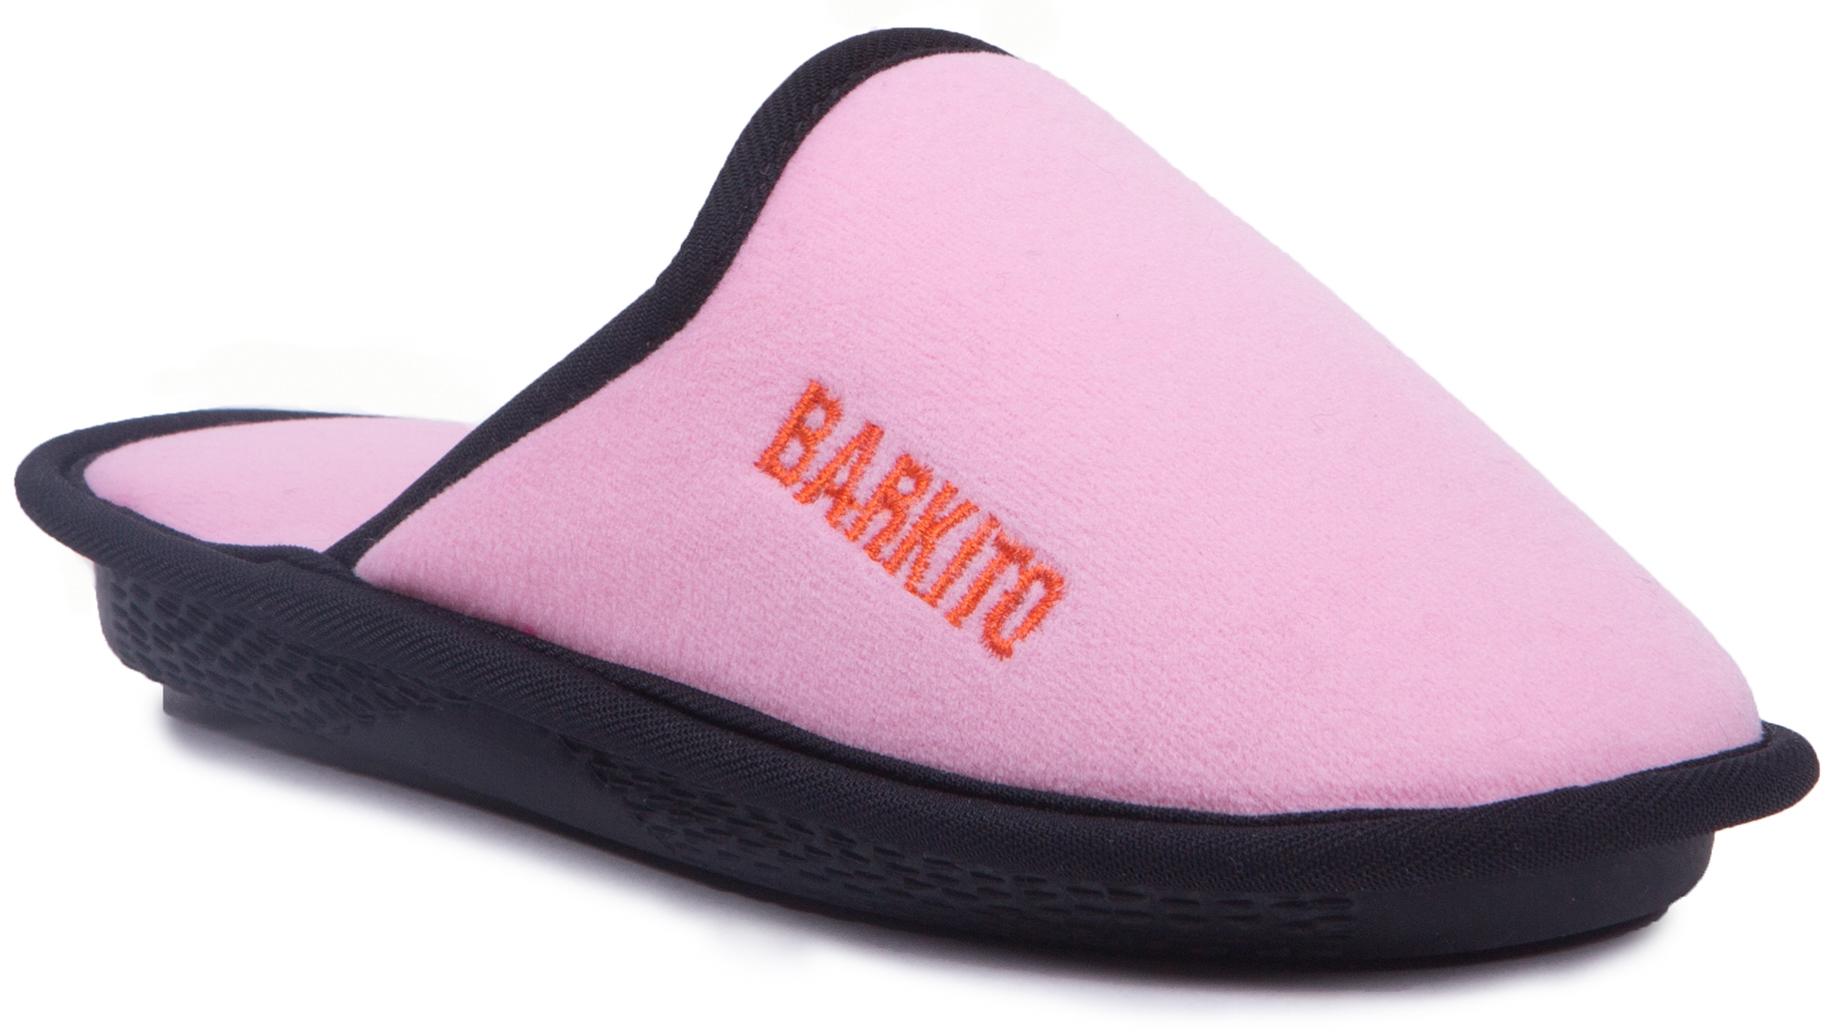 Пантолеты Barkito для девочки пантолеты barkito frozen fz006559